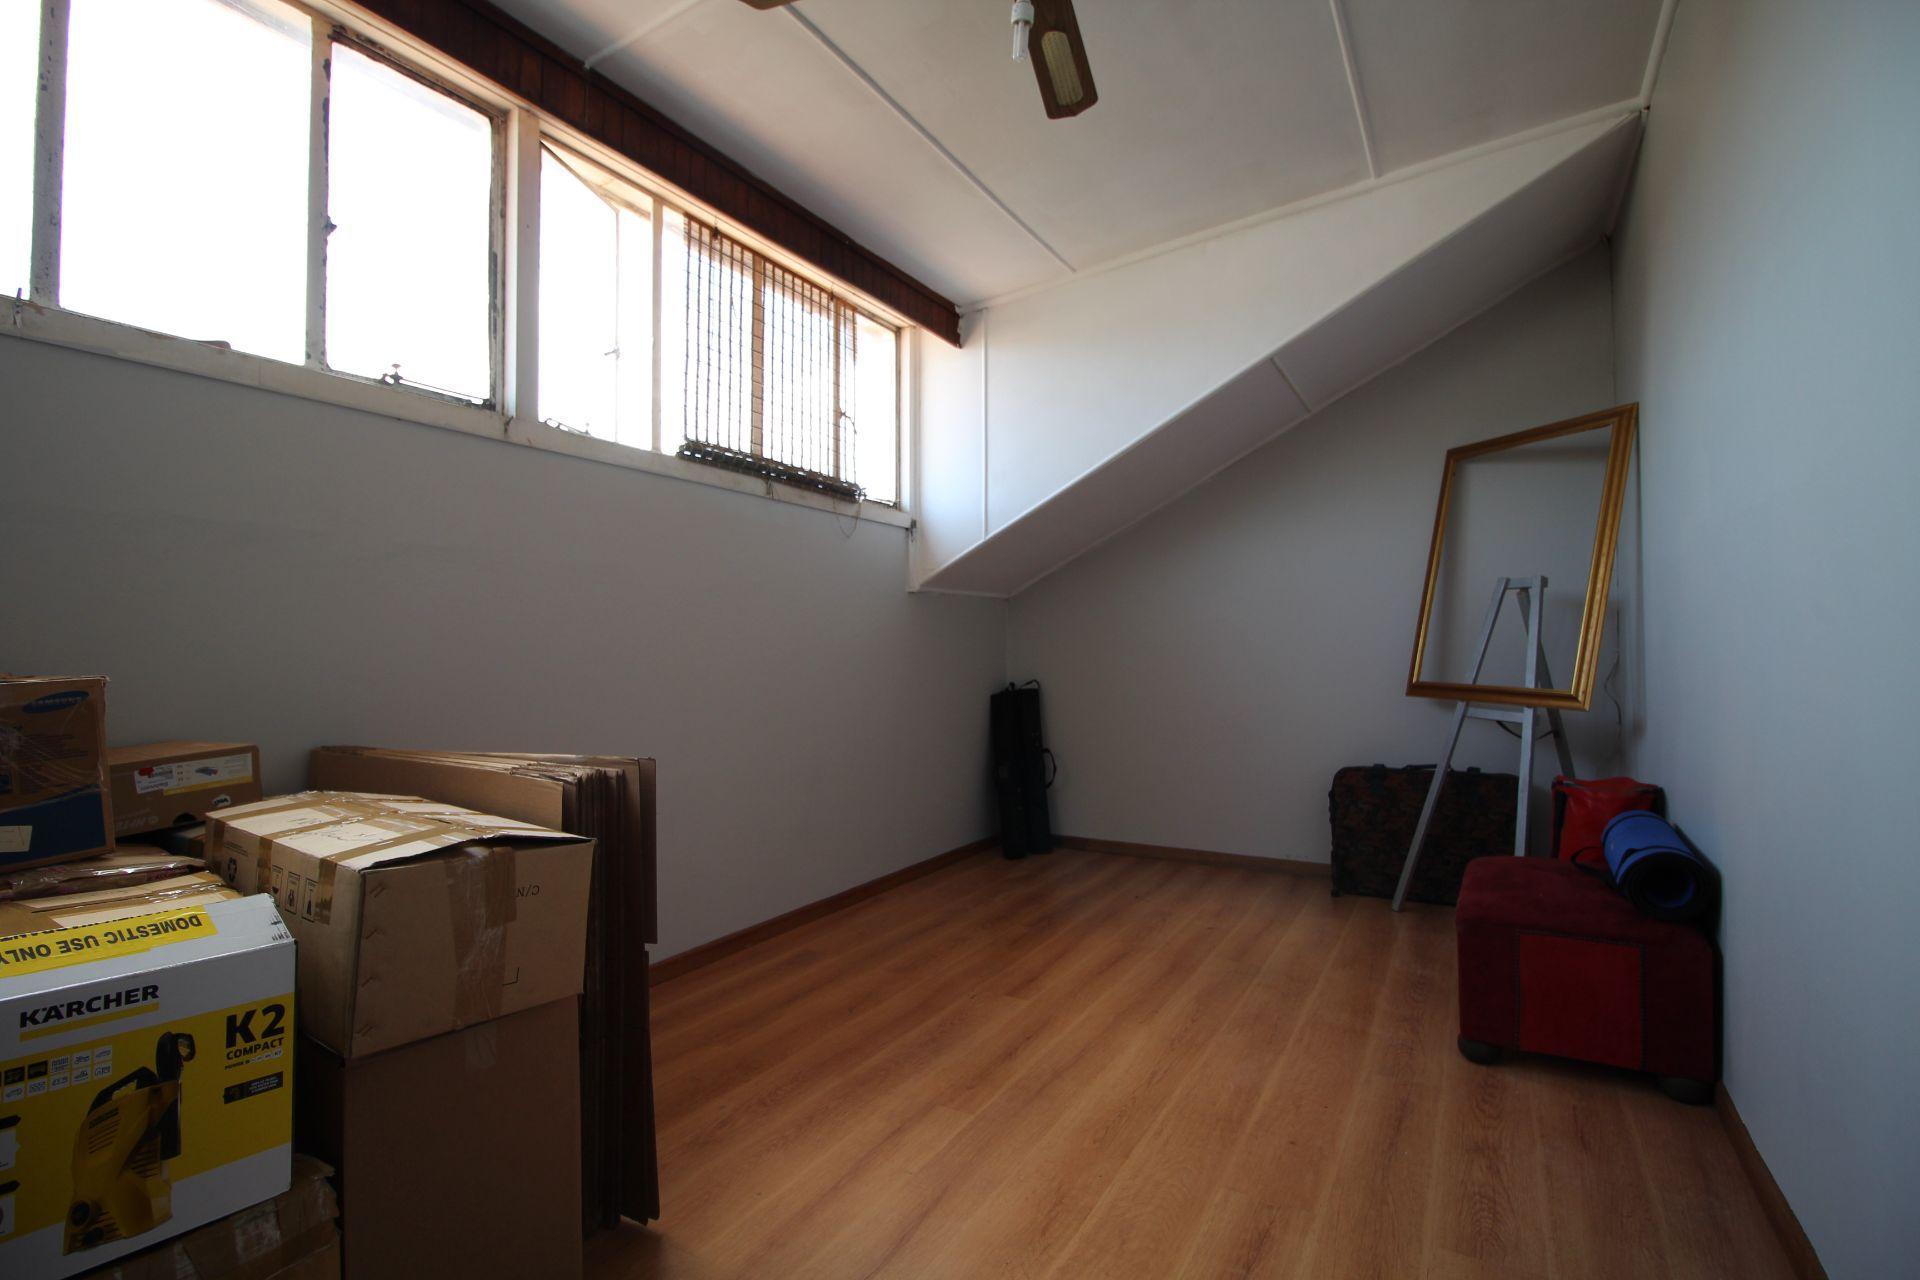 House For Sale In Cambridge 3 Bedroom 13577985 5 18 Tivvit